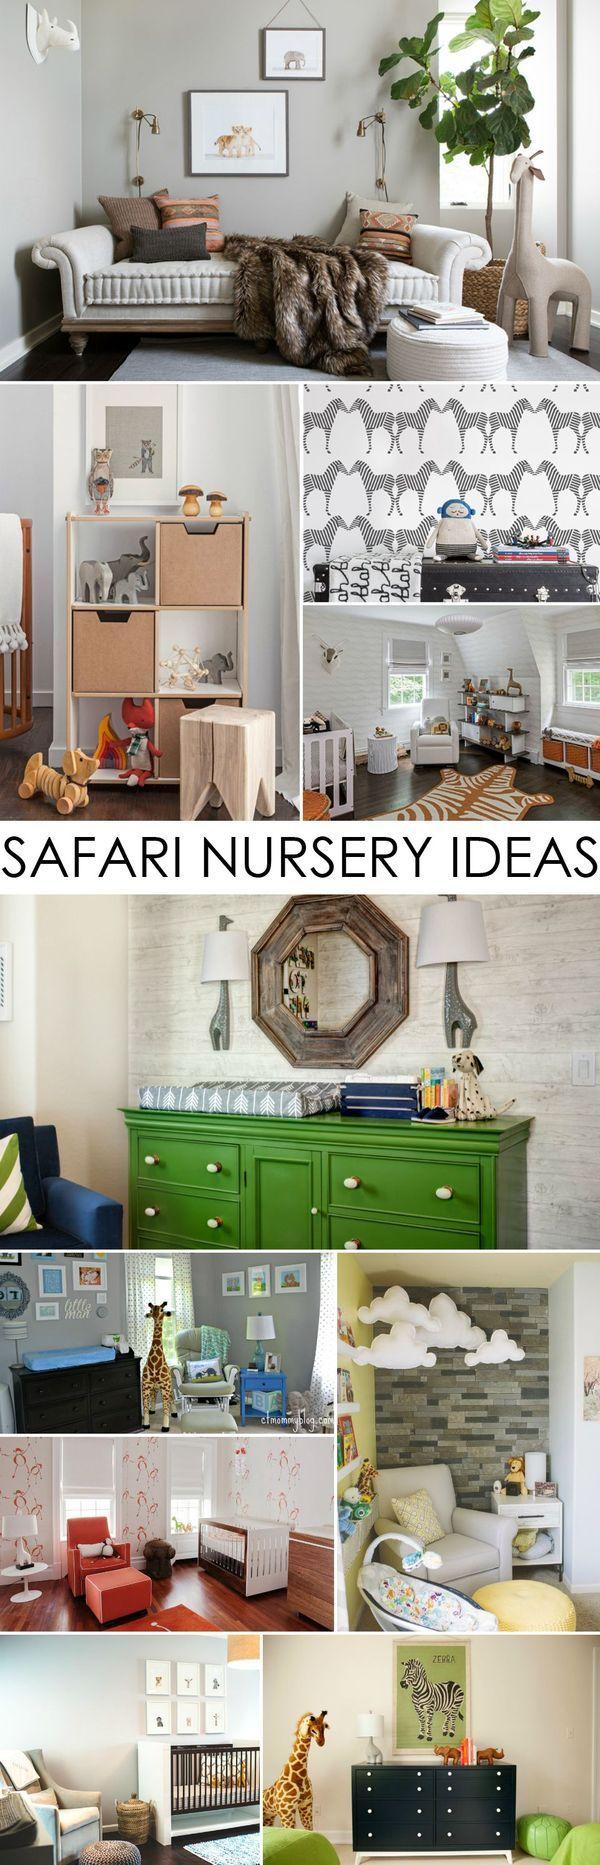 best 25 safari theme bedroom ideas on pinterest safari room project nursery s favorite safari nursery ideas from super mod to classic and sweet